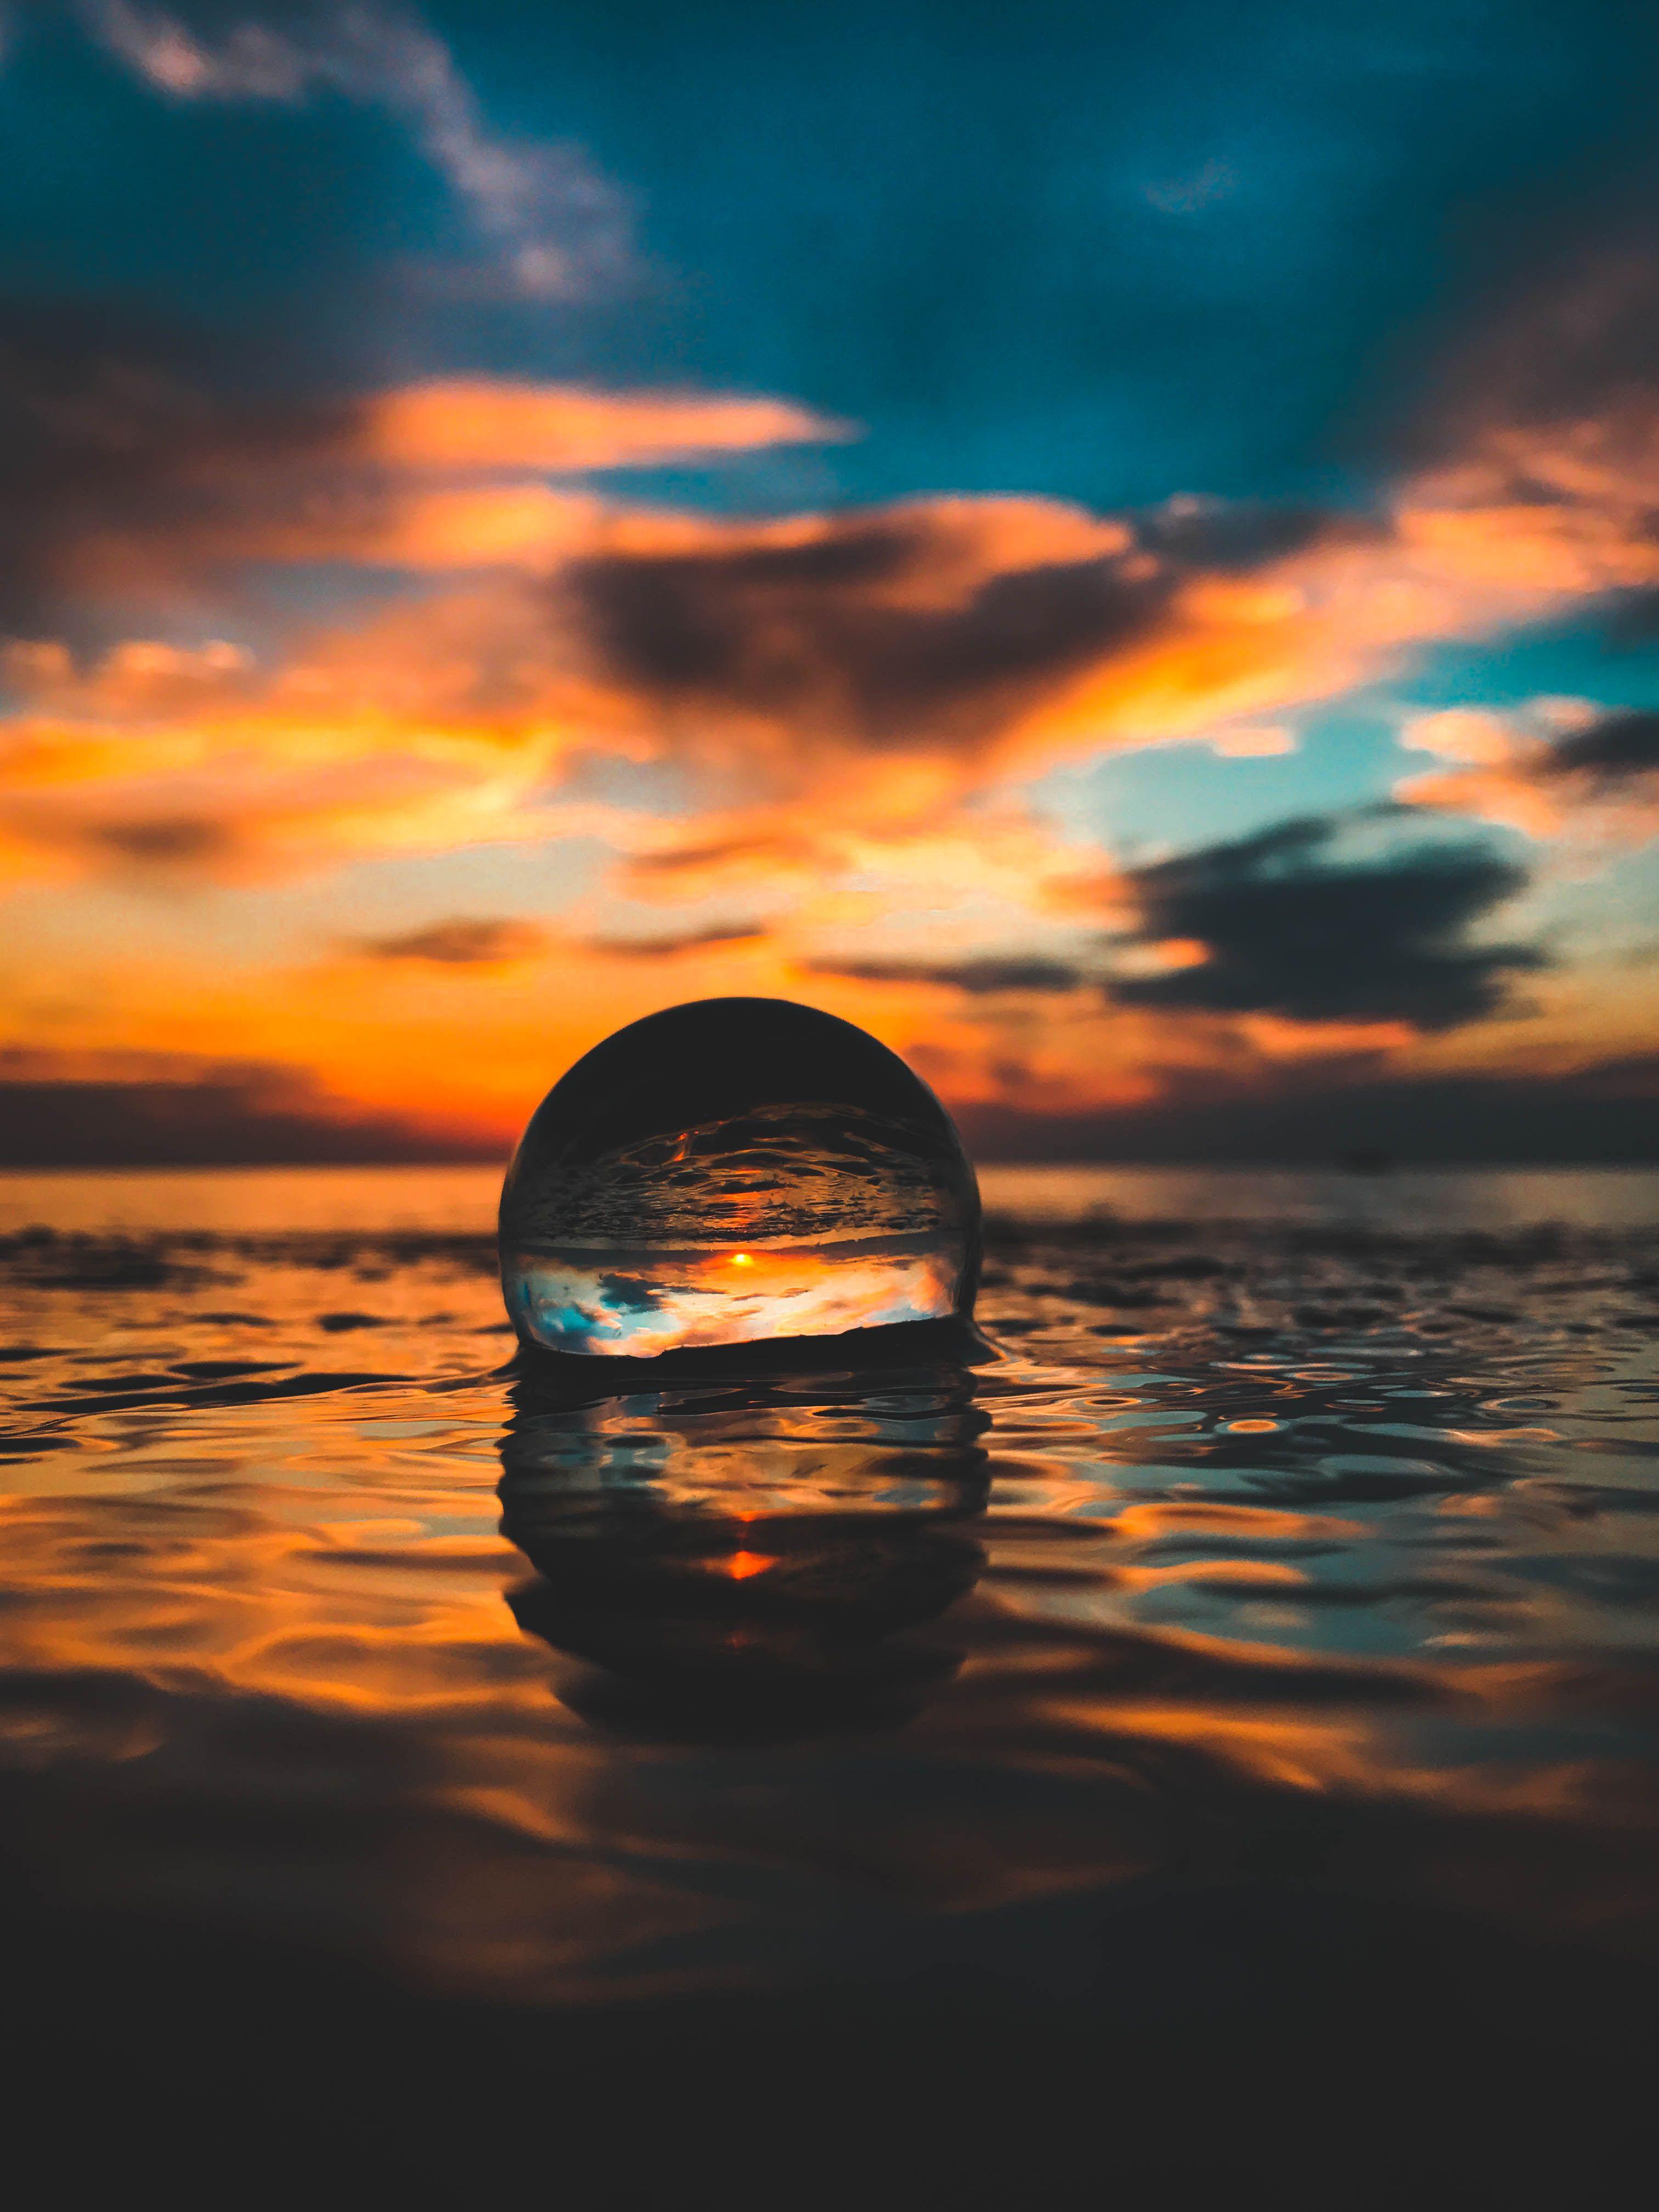 Original Lensball Crystal Photography Nature Photography Sunset Photography Wallpaper glass ball beach sand wave